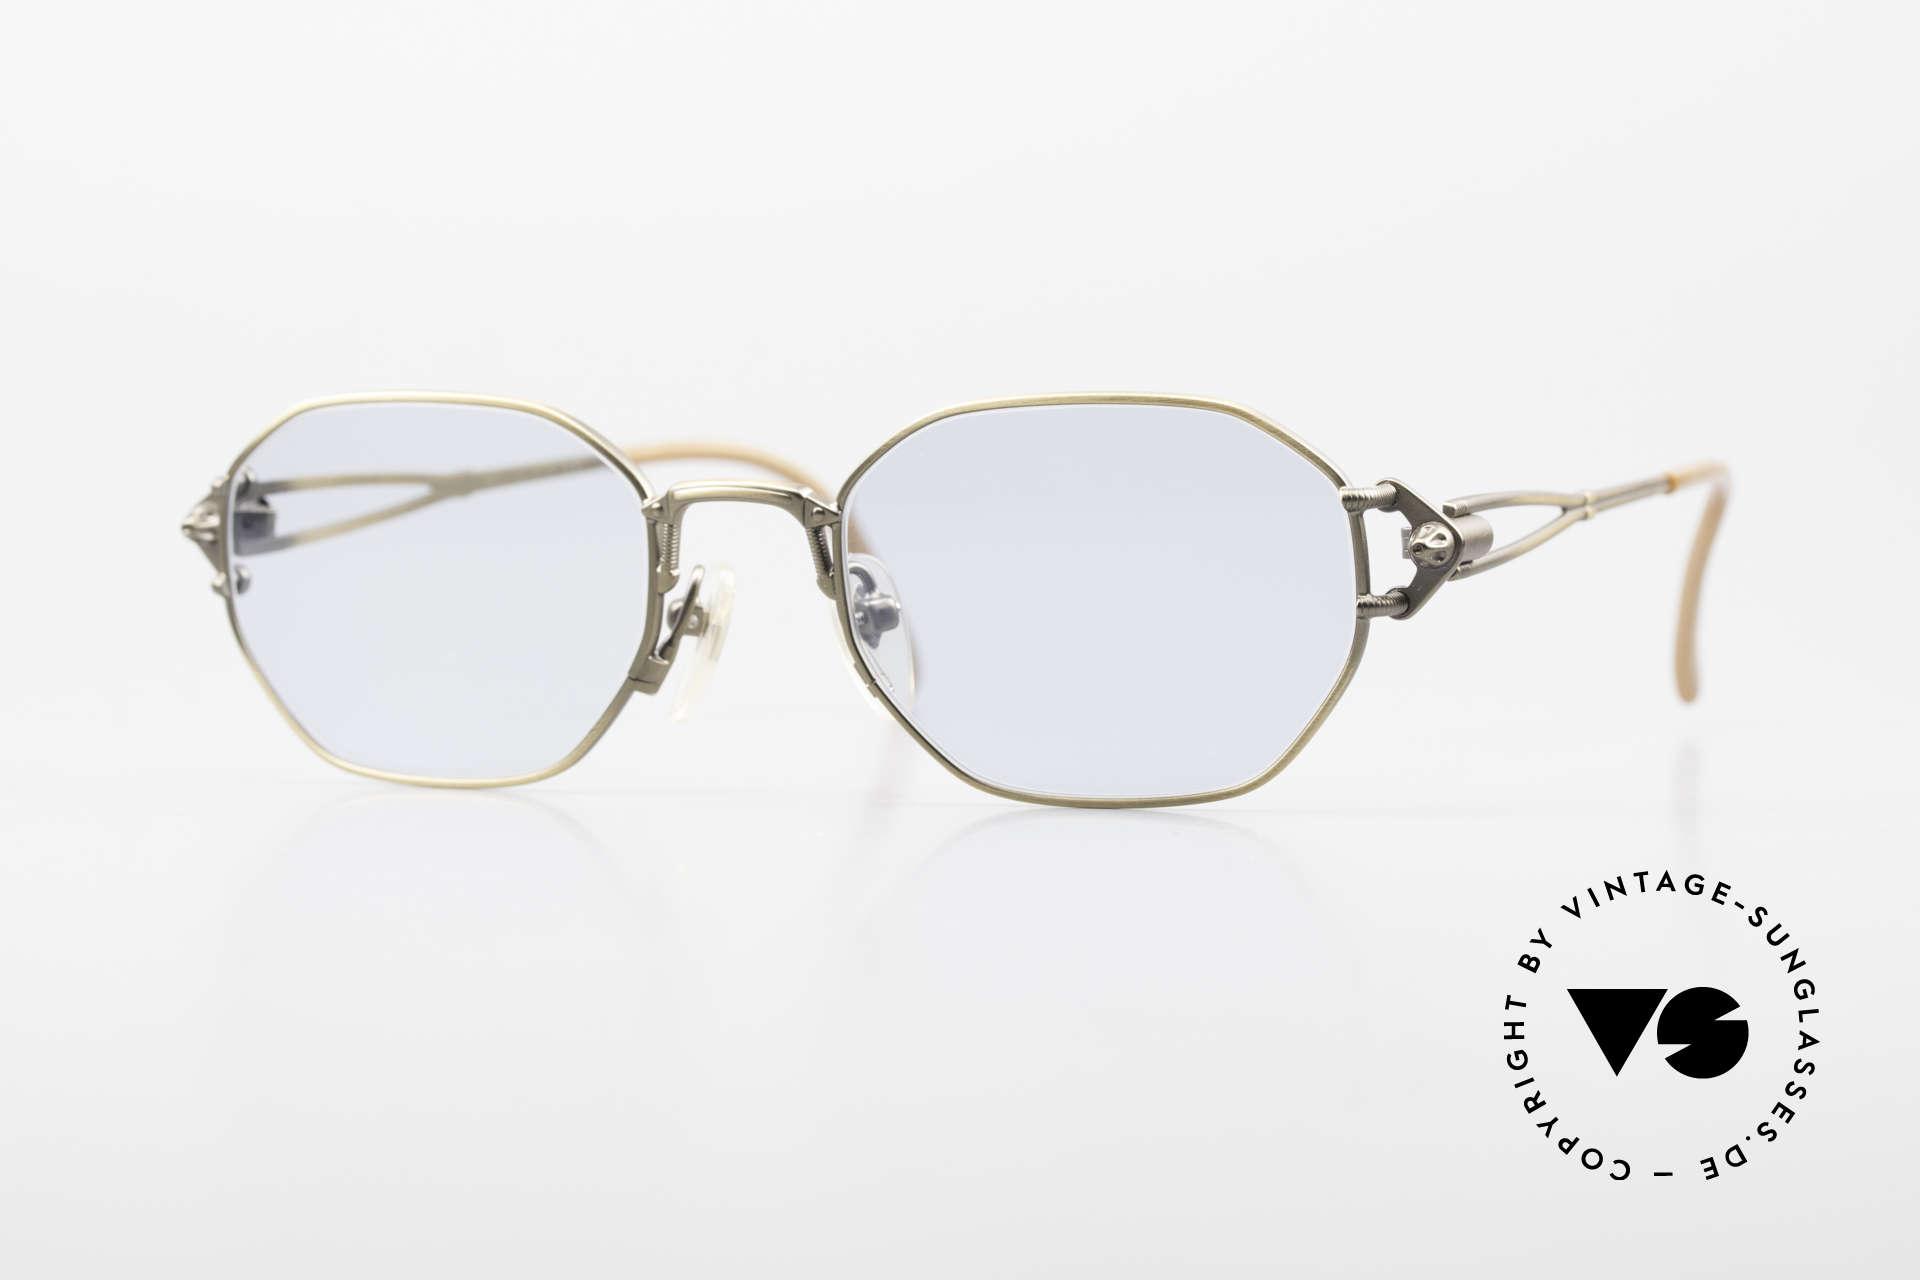 Jean Paul Gaultier 55-6106 Old 90's Designer Sunglasses, precious Jean Paul Gaultier sunglasses from app. 1994, Made for Men and Women